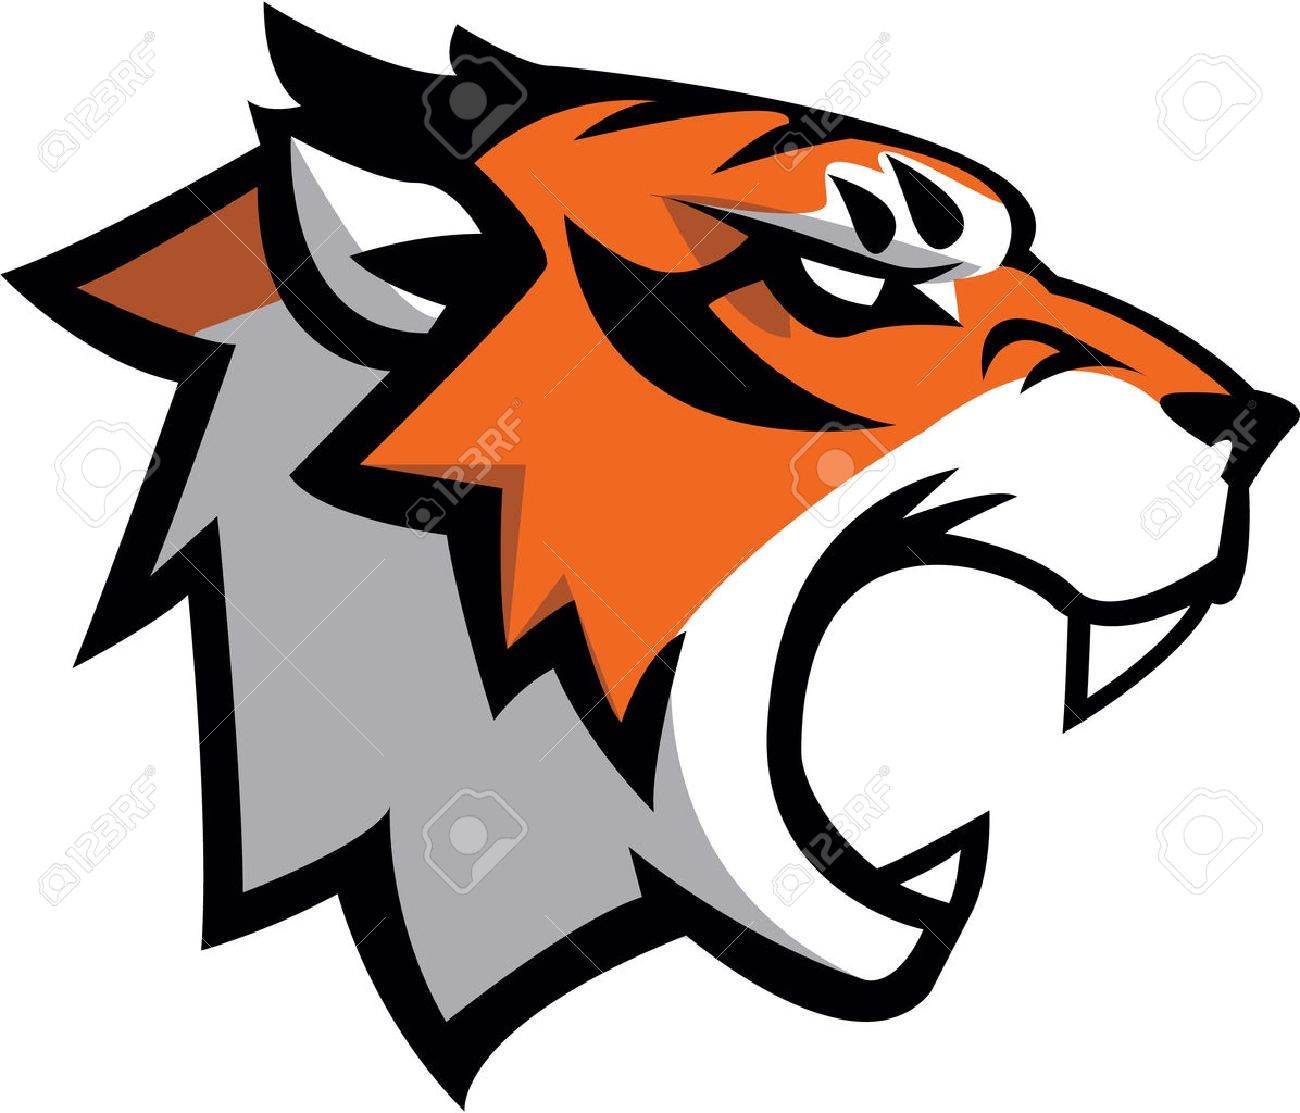 Tiger Symbol illustration design - 46241853